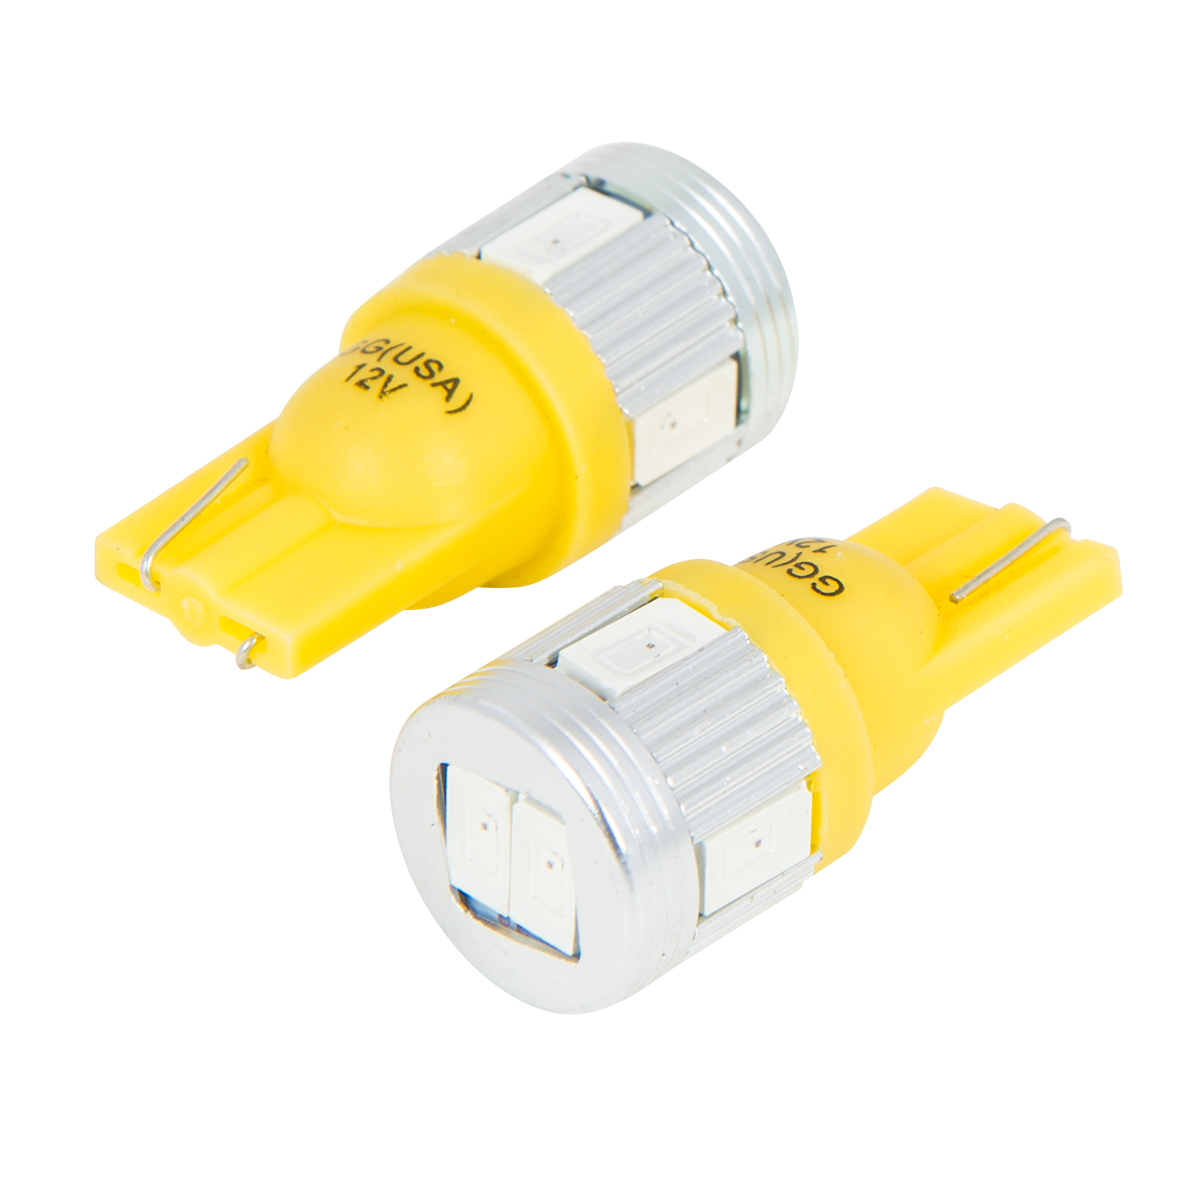 70600 194/168 Tower Style 6 High Power LED Light Bulb